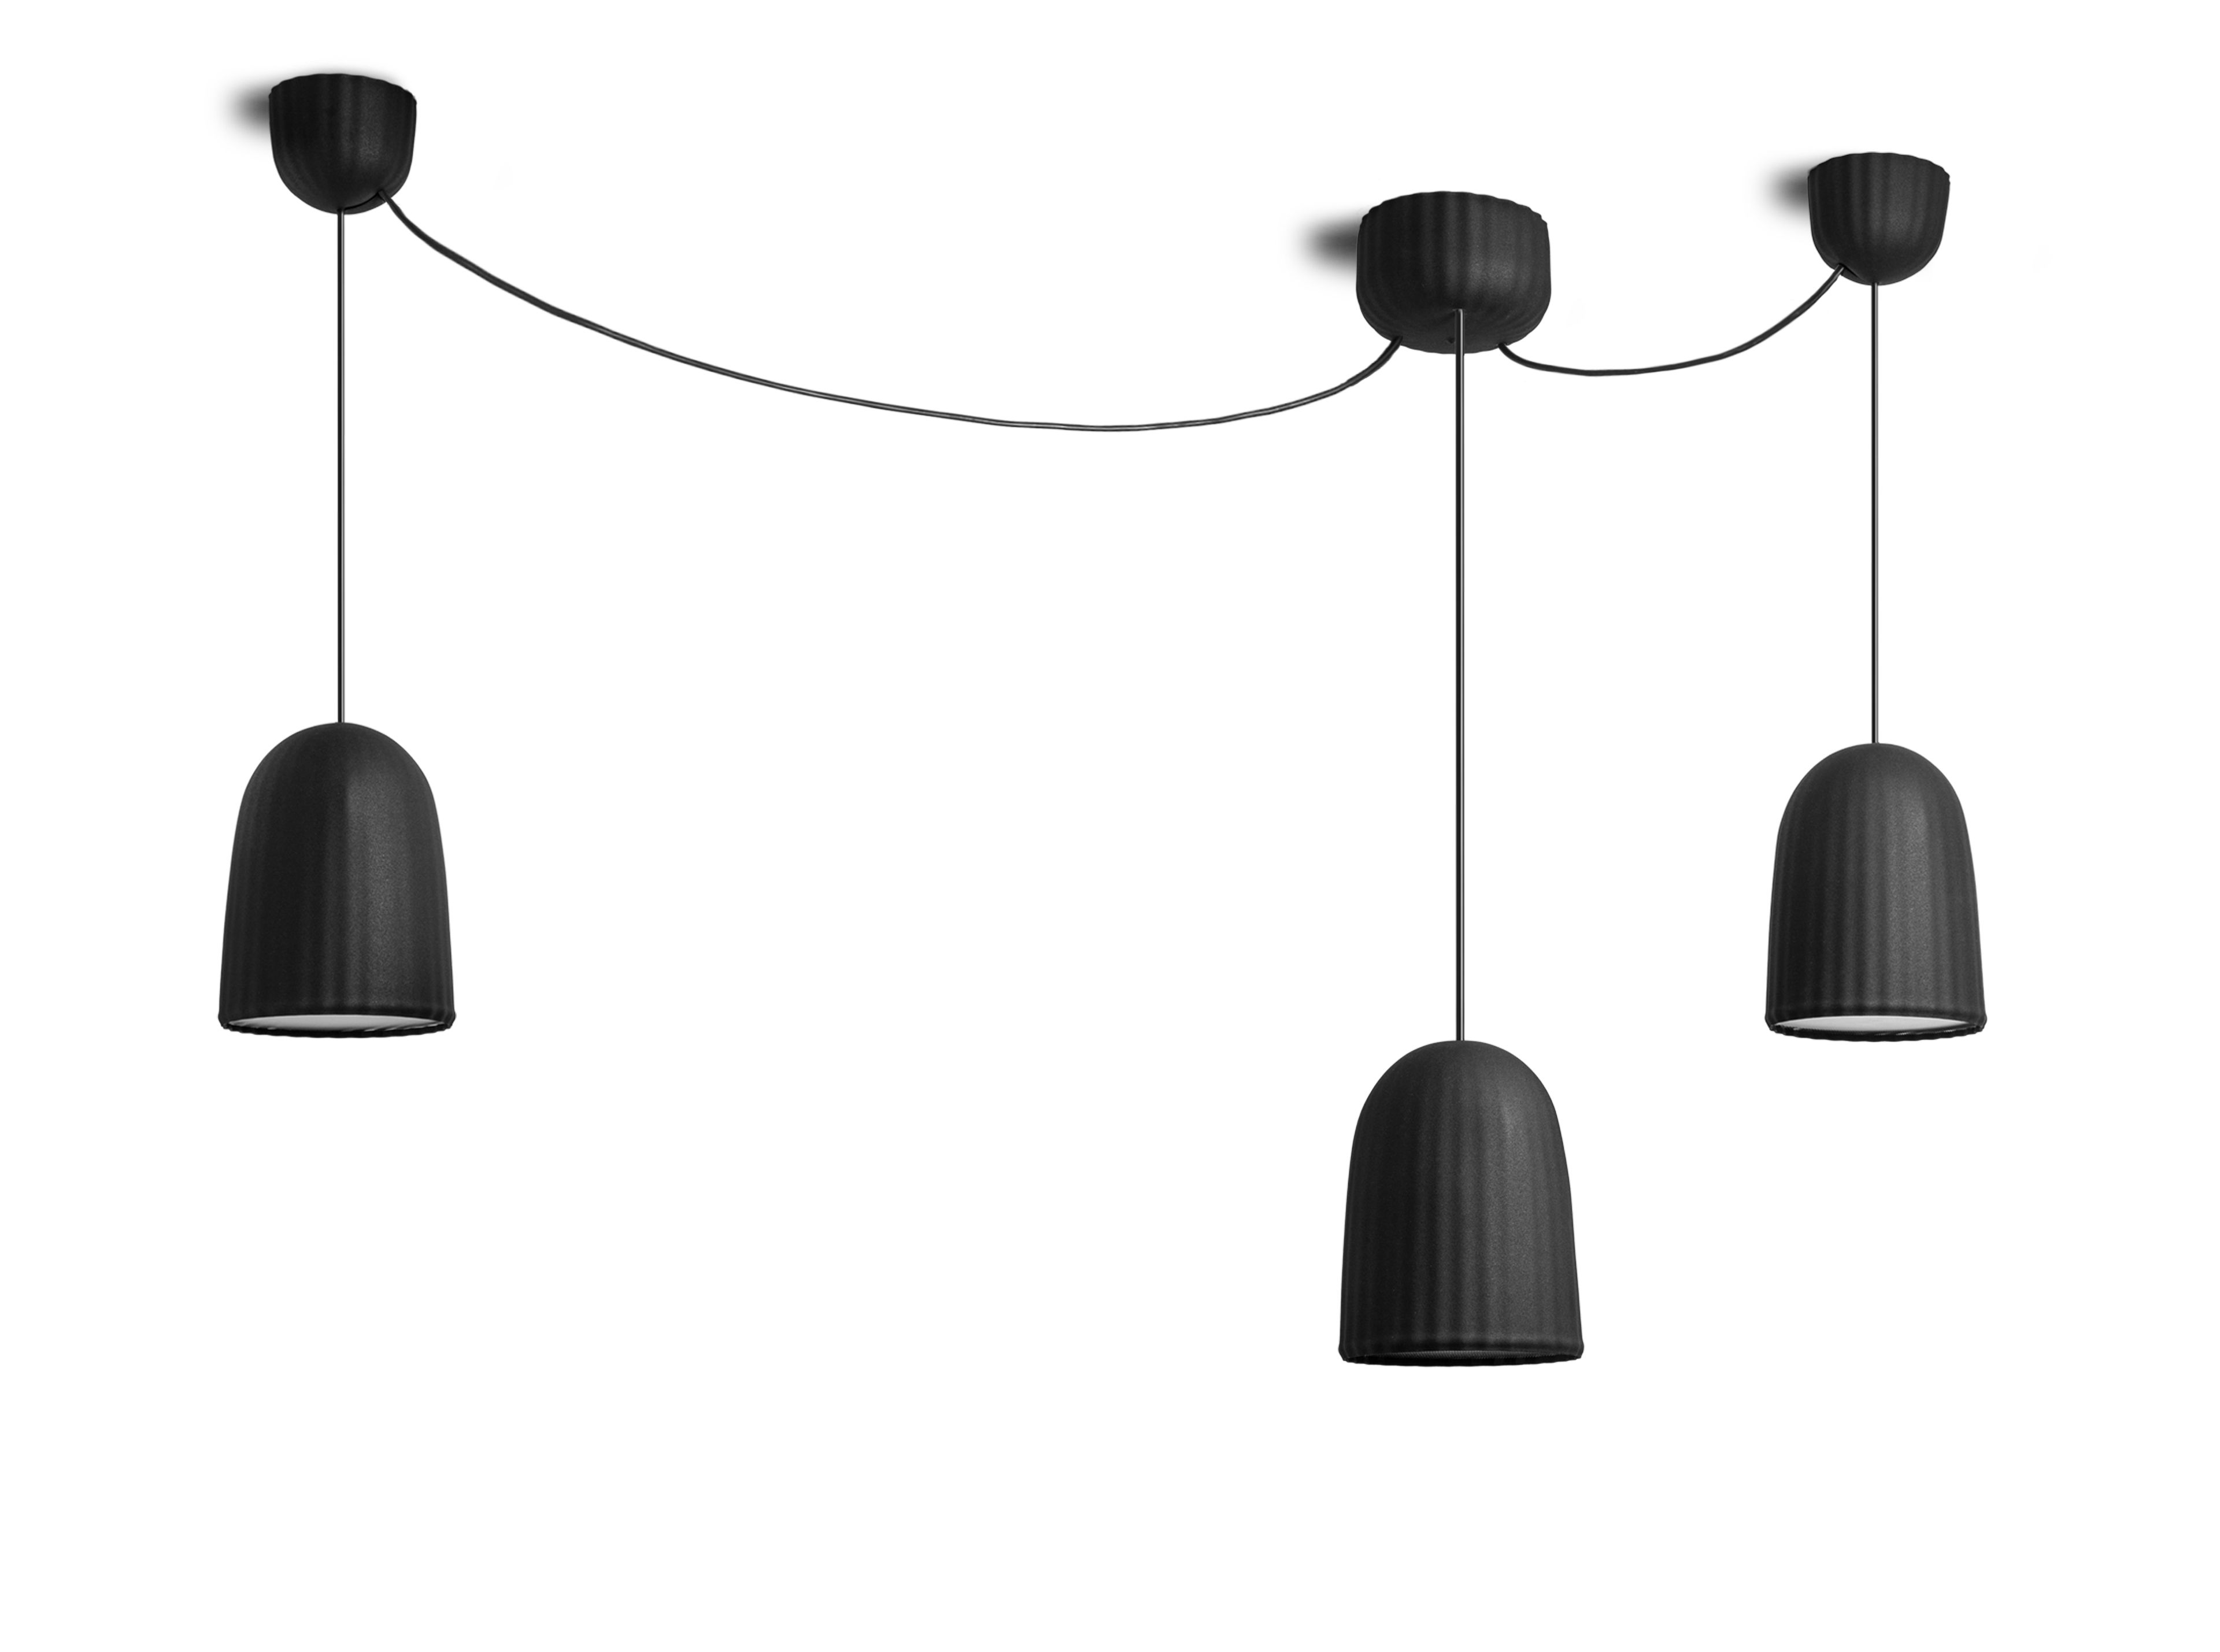 suspension chains multiple petite friture noir made in. Black Bedroom Furniture Sets. Home Design Ideas